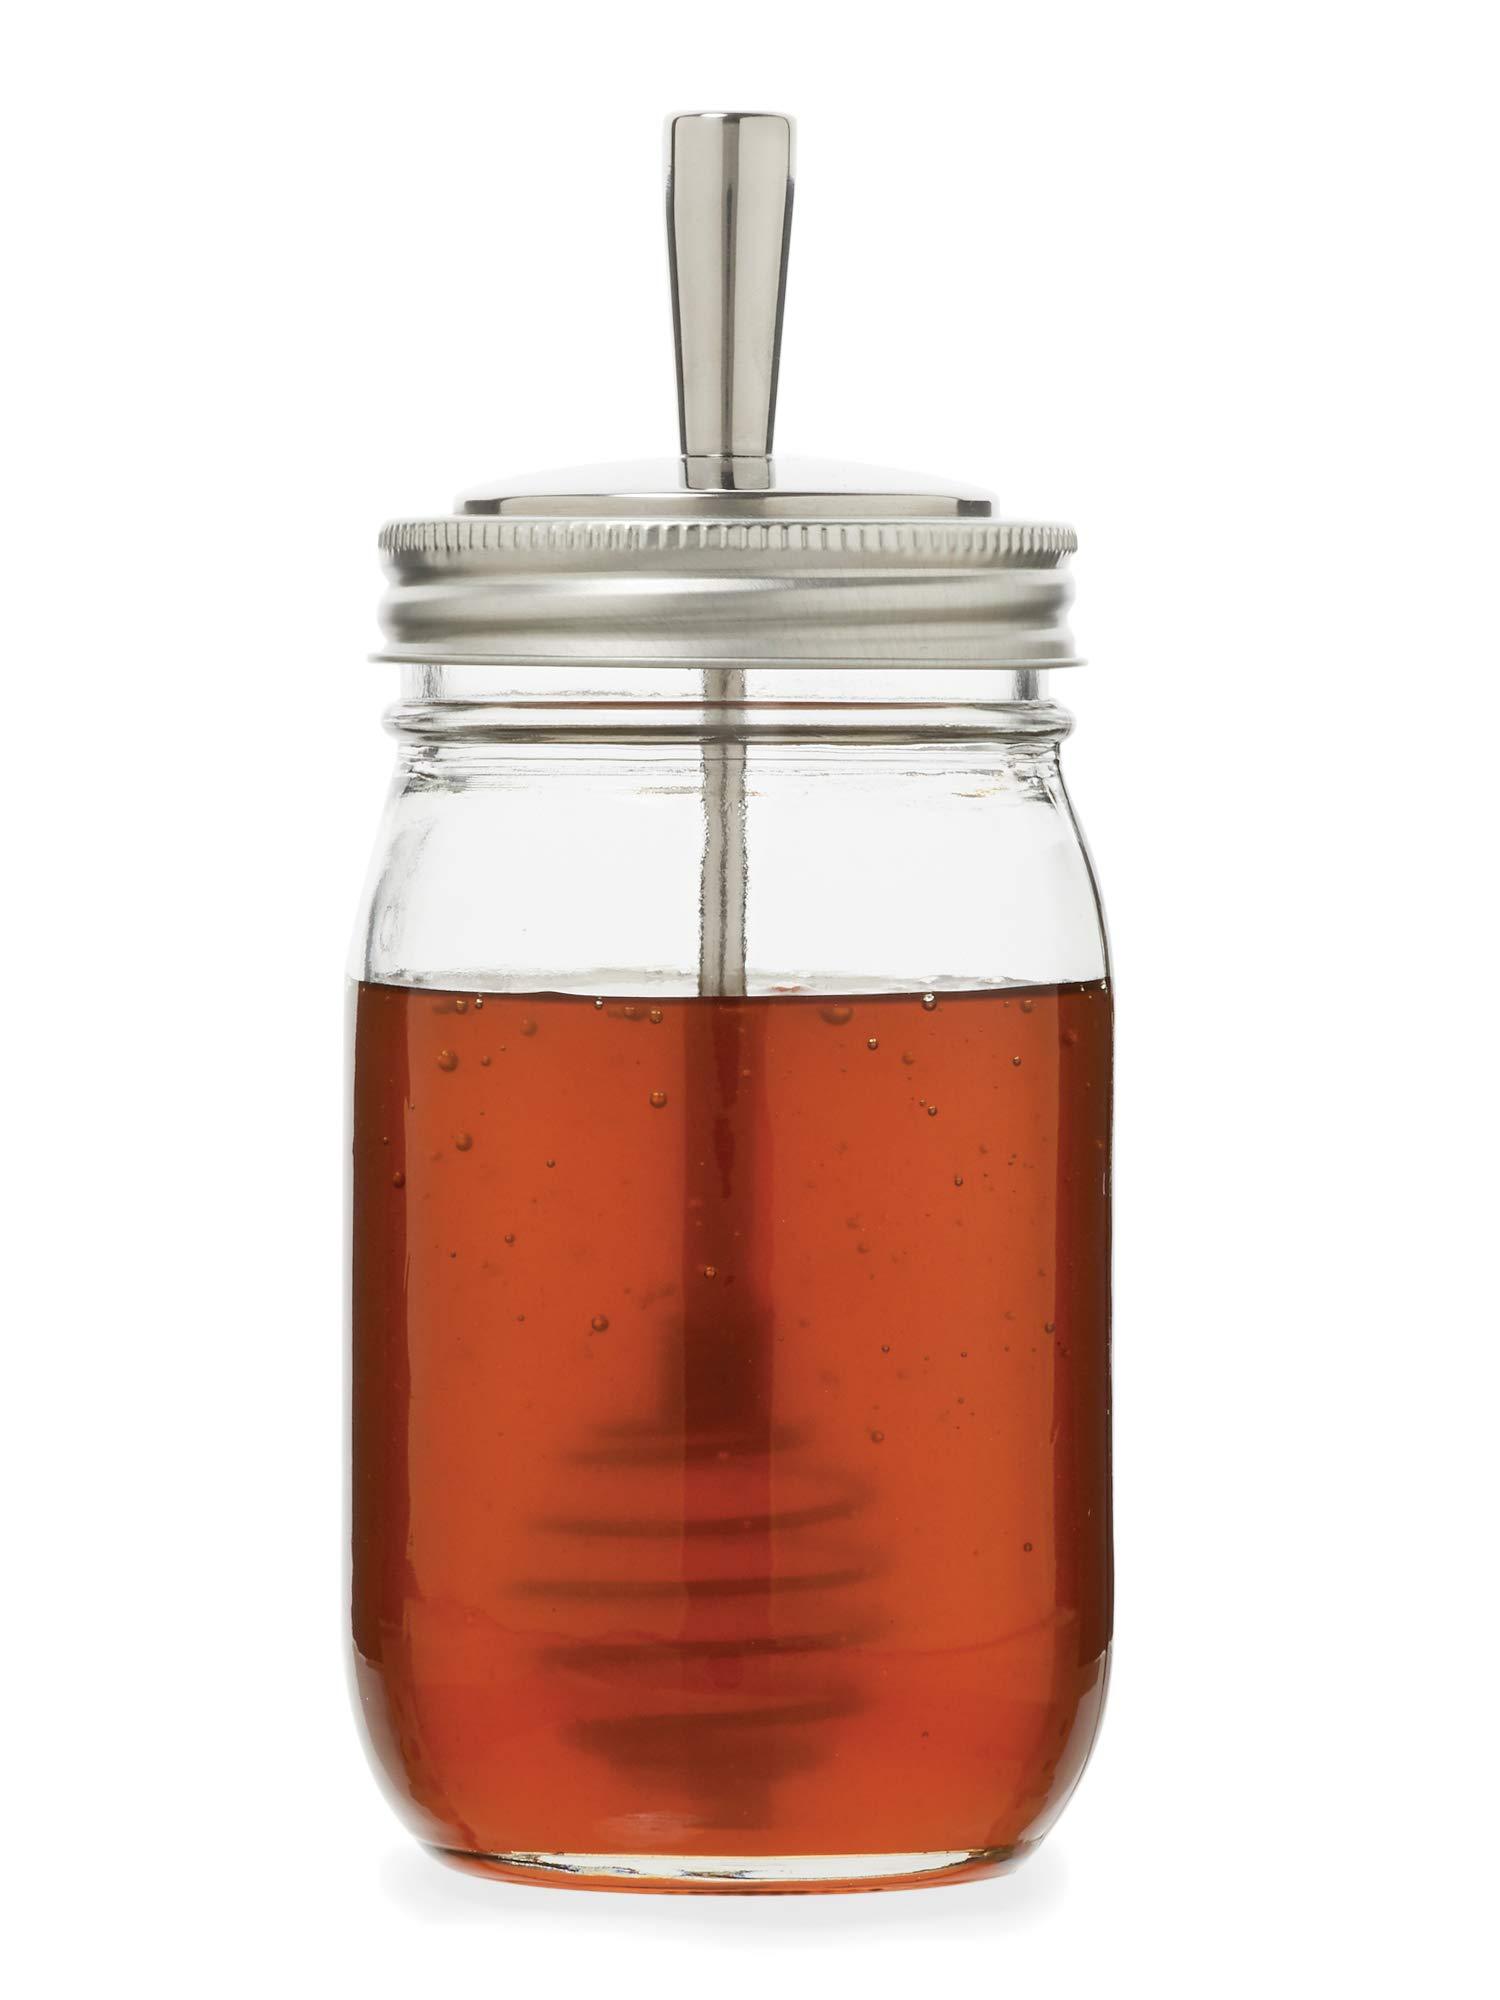 Jarware 82653 Metal Mason Jar Honey Dipper Lid Regular Mouth Stainless Steel